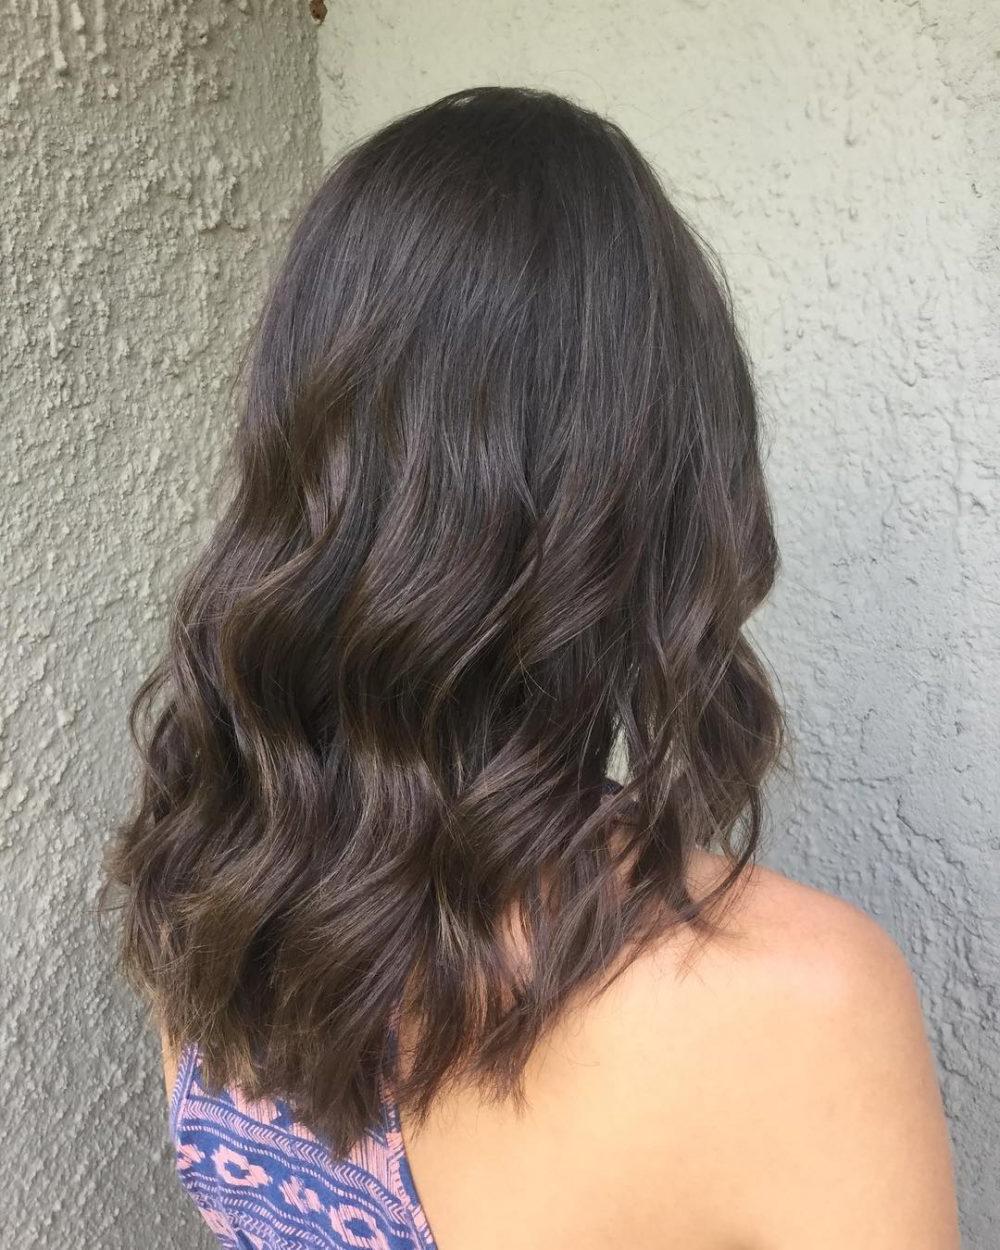 2020 Latest Mid-Length Beach Waves Hairstyles